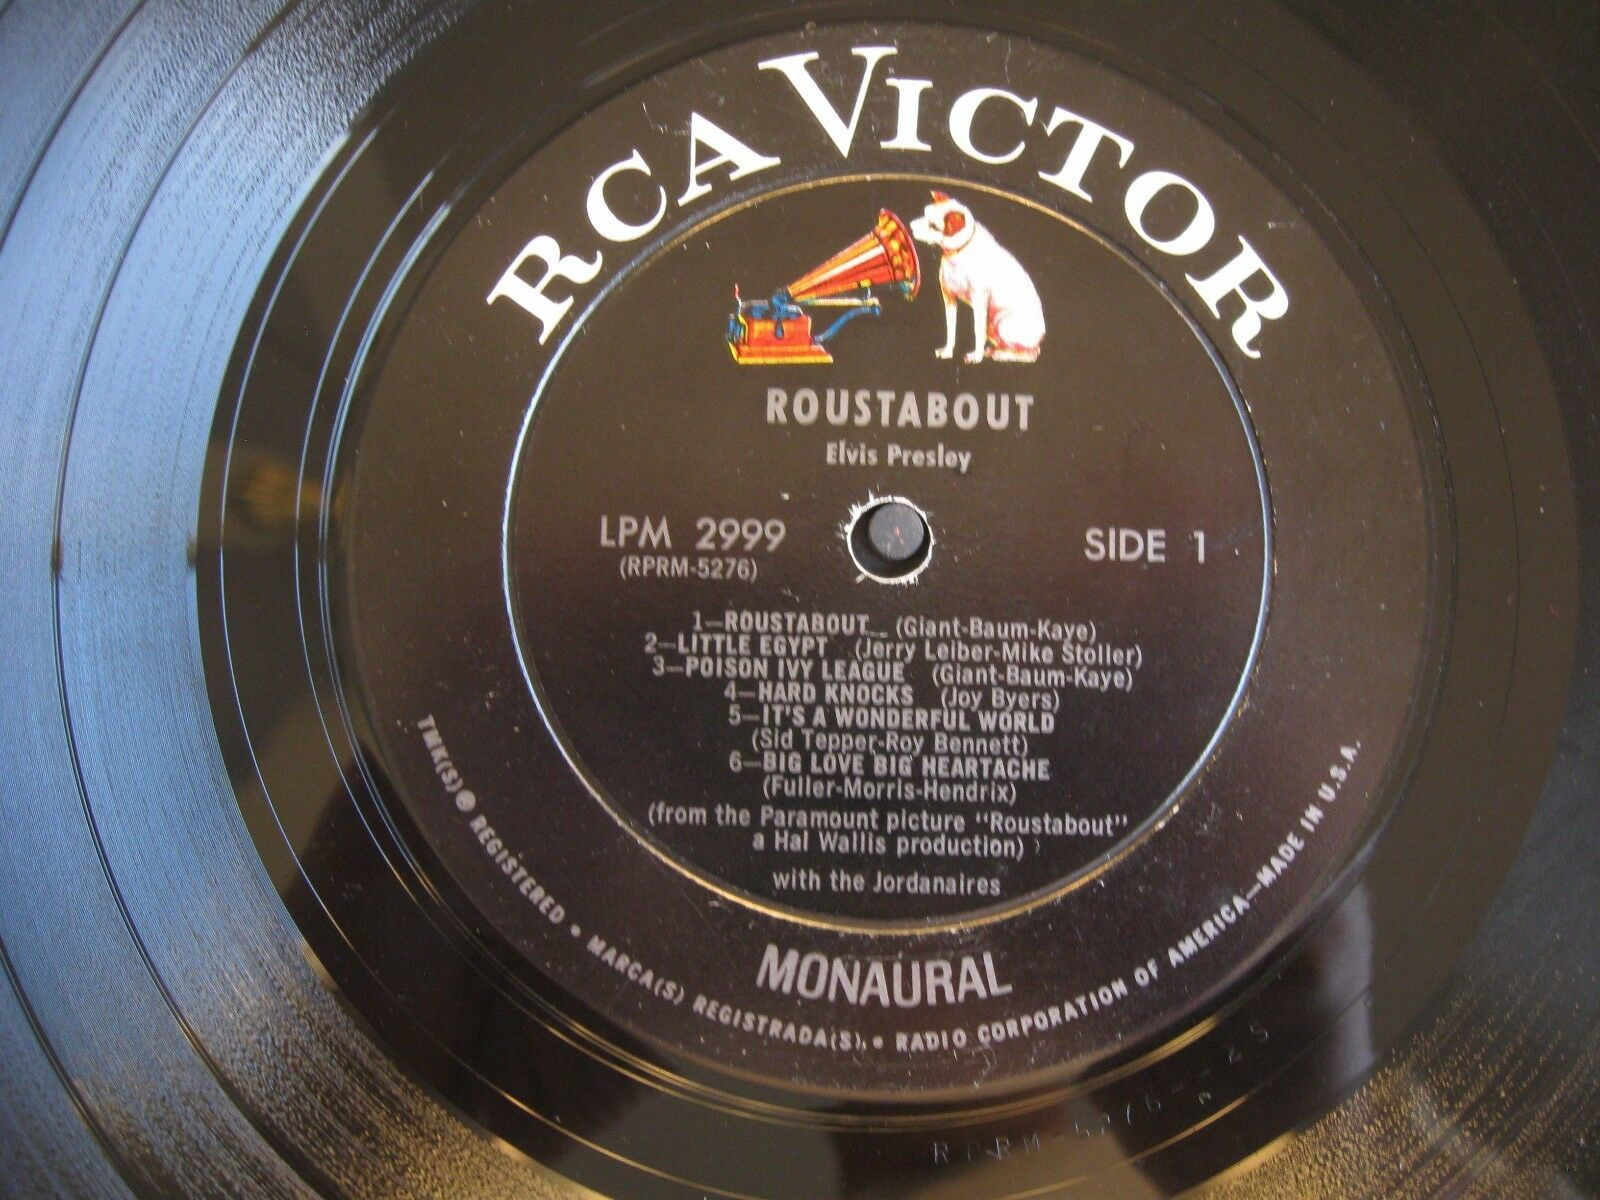 Elvis Presley Roustabout RCA LPM-2999 Mono Vinyl Record LP image 4